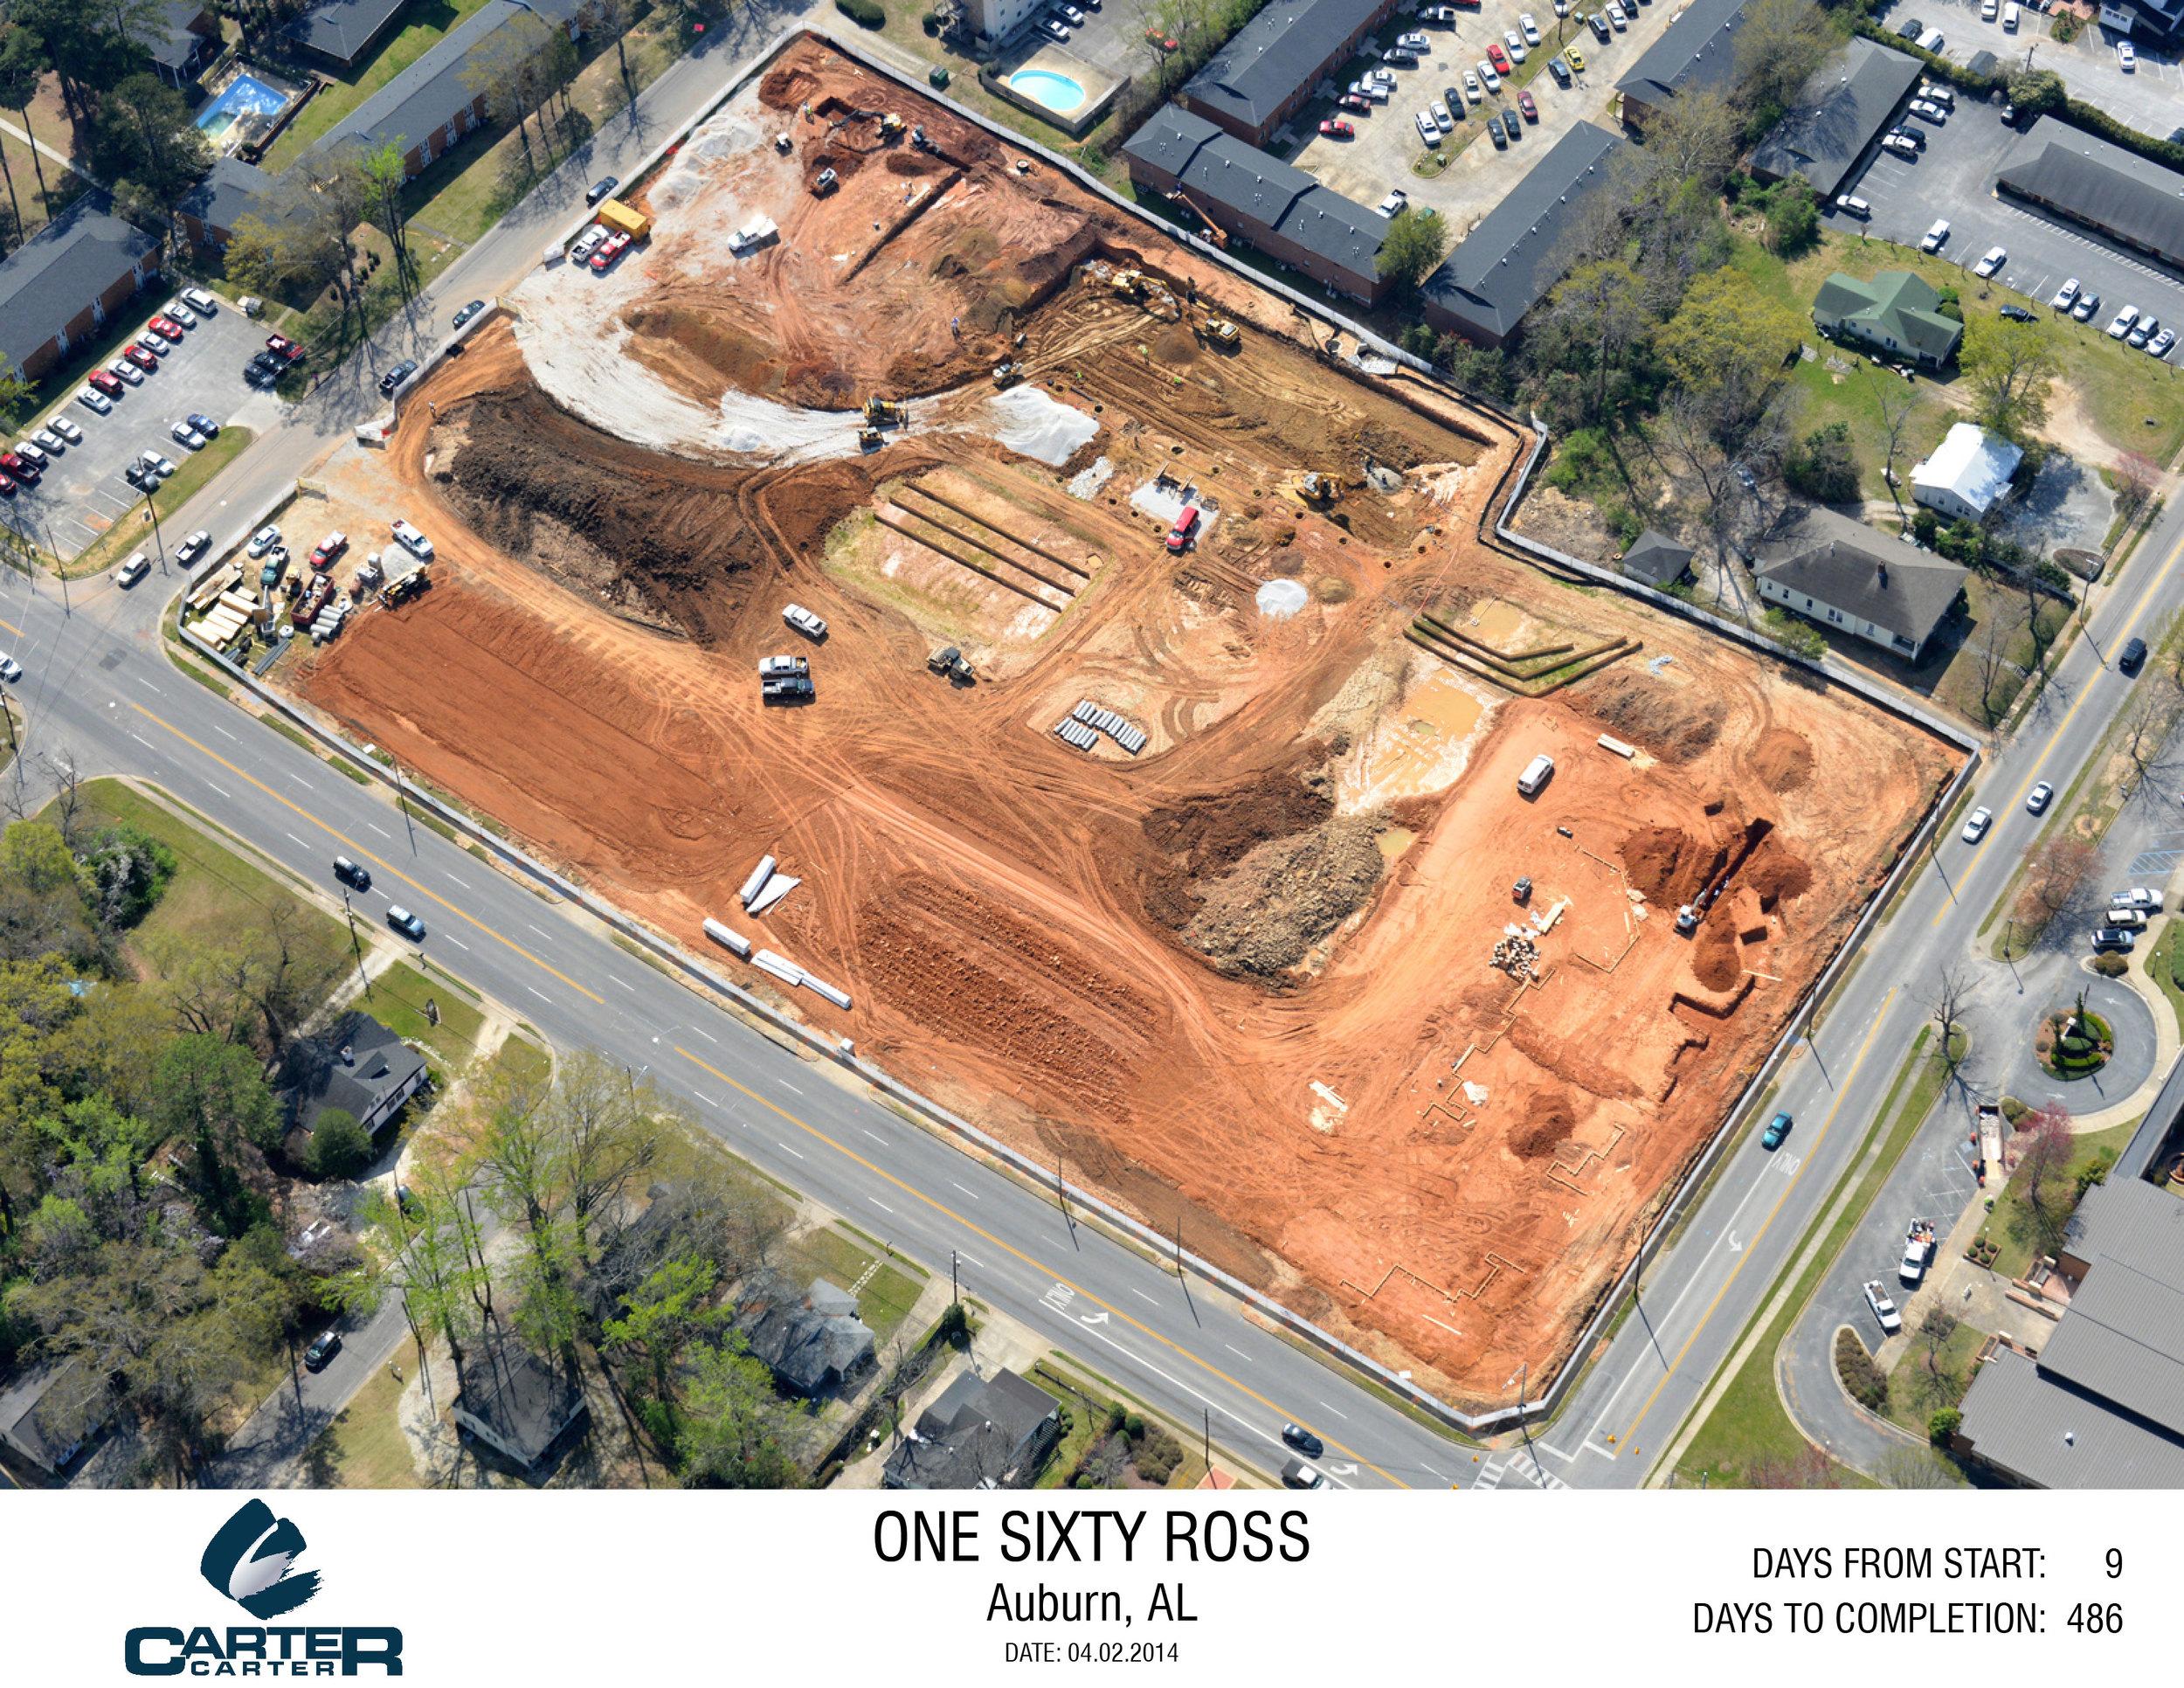 One Sixty Ross 1404022011-01.jpg